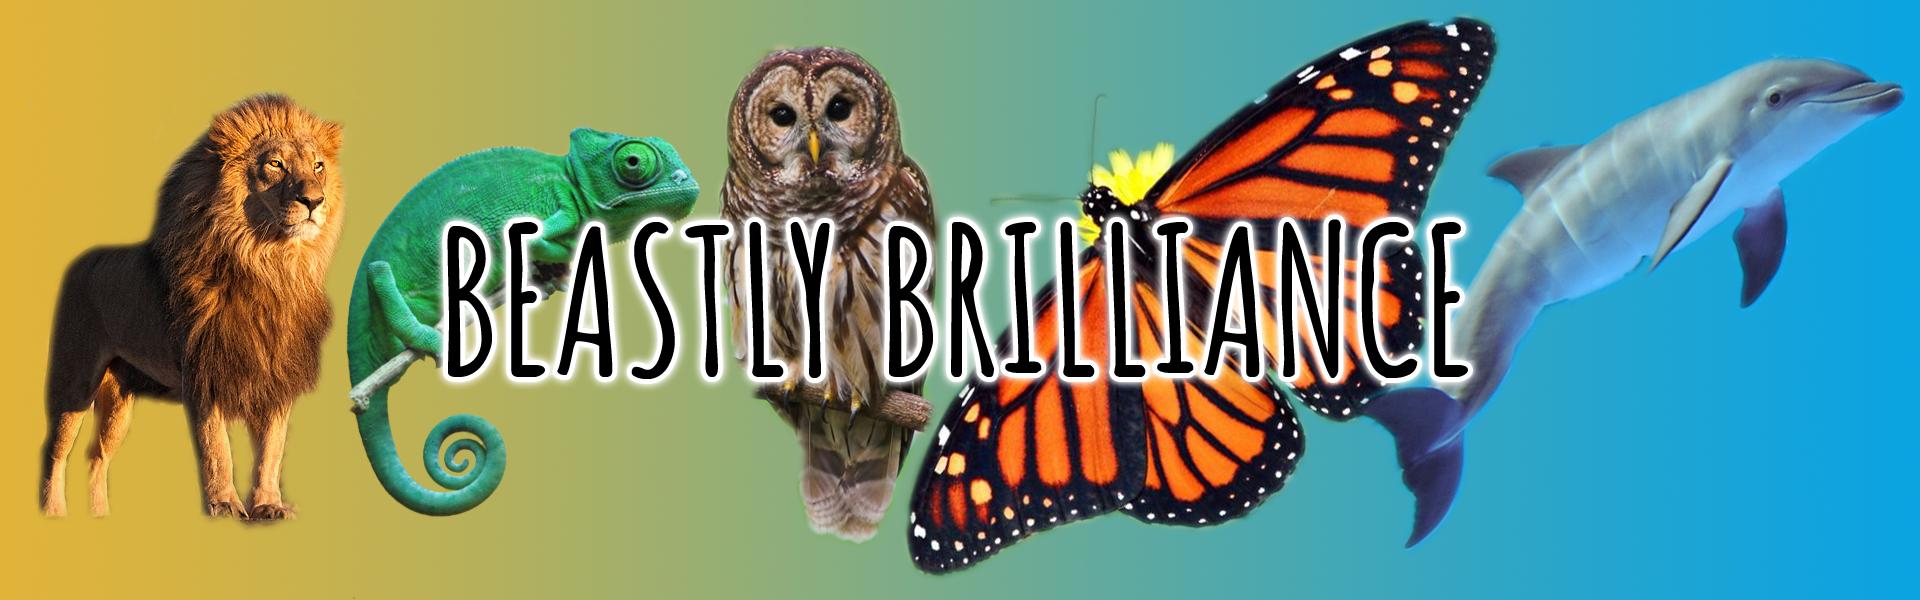 Beastly Brilliance Header Banner